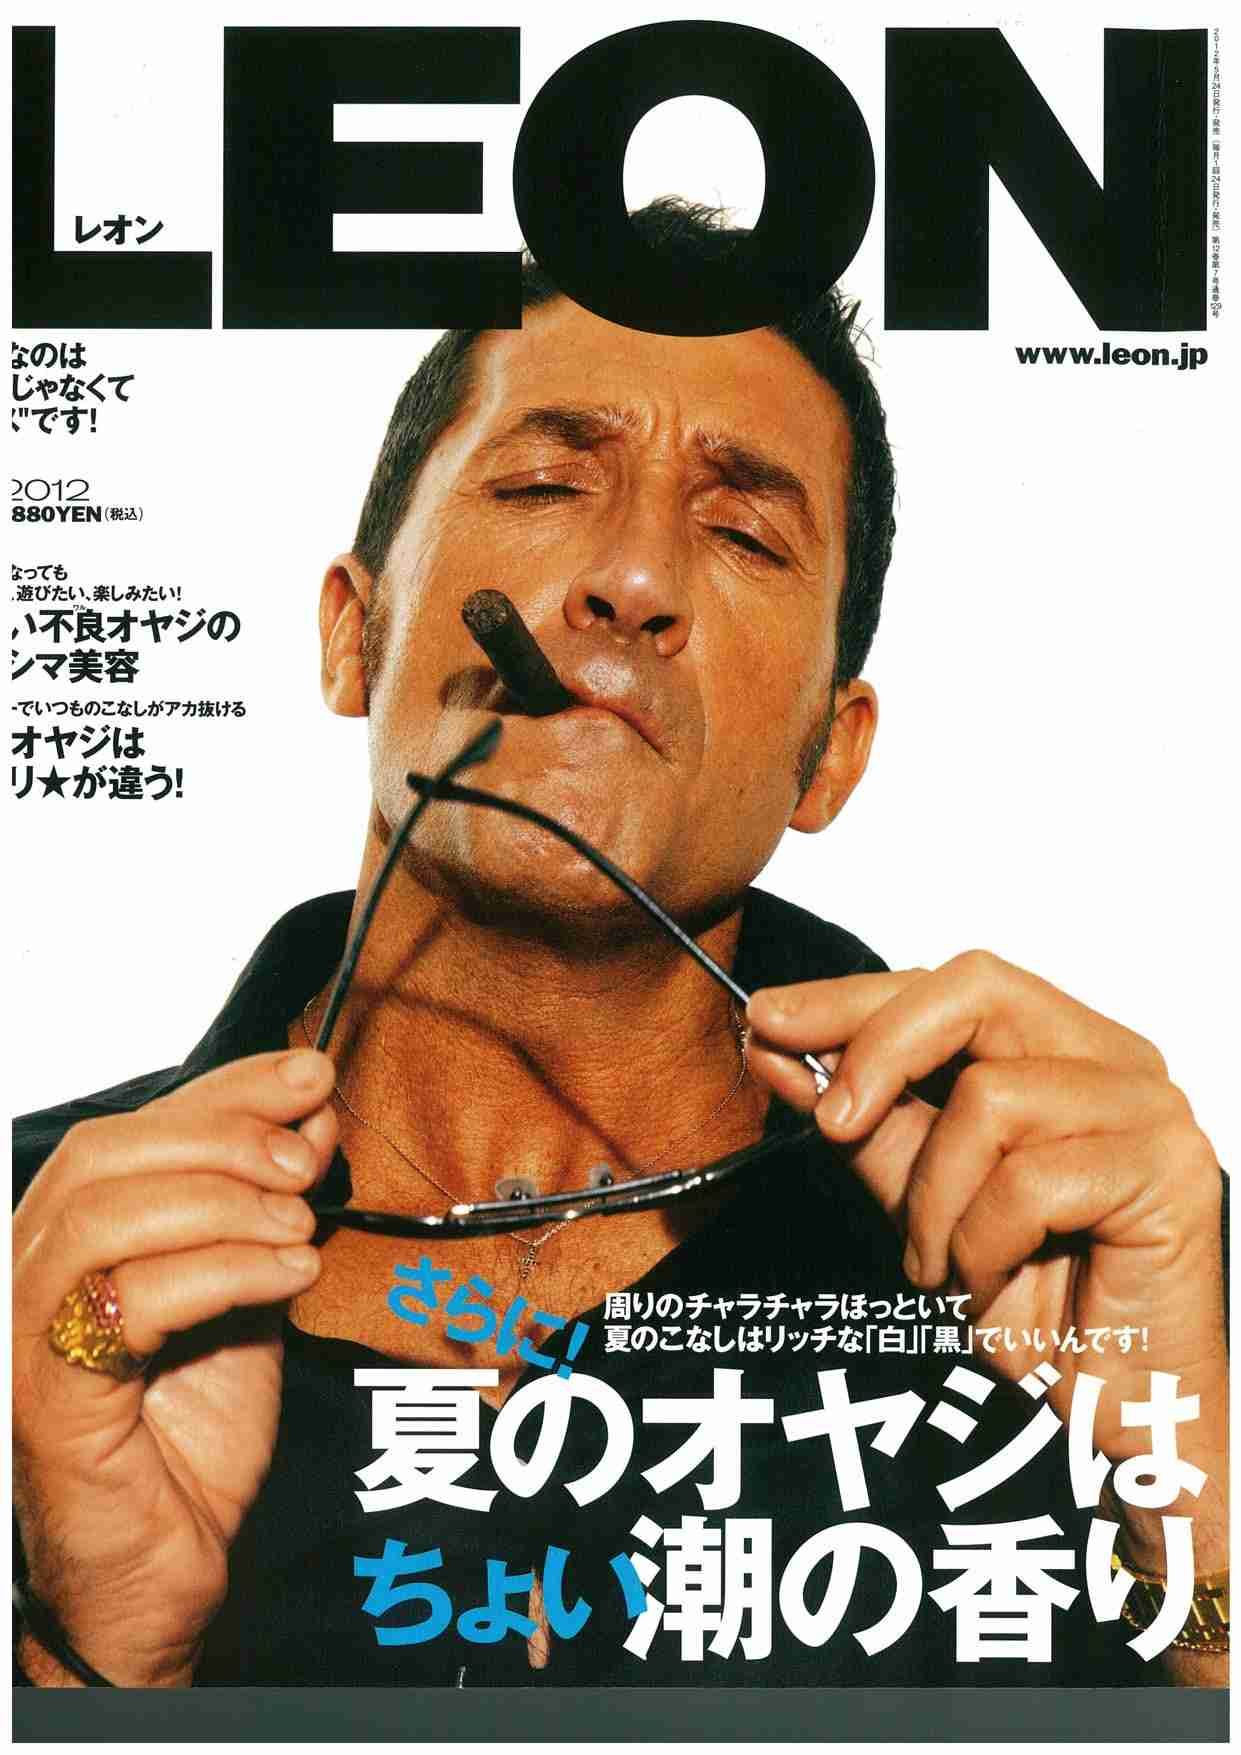 LEON japan life style magazine - Girolamo Panzetta cigar smoking - cigarmonkeys.com - cigar